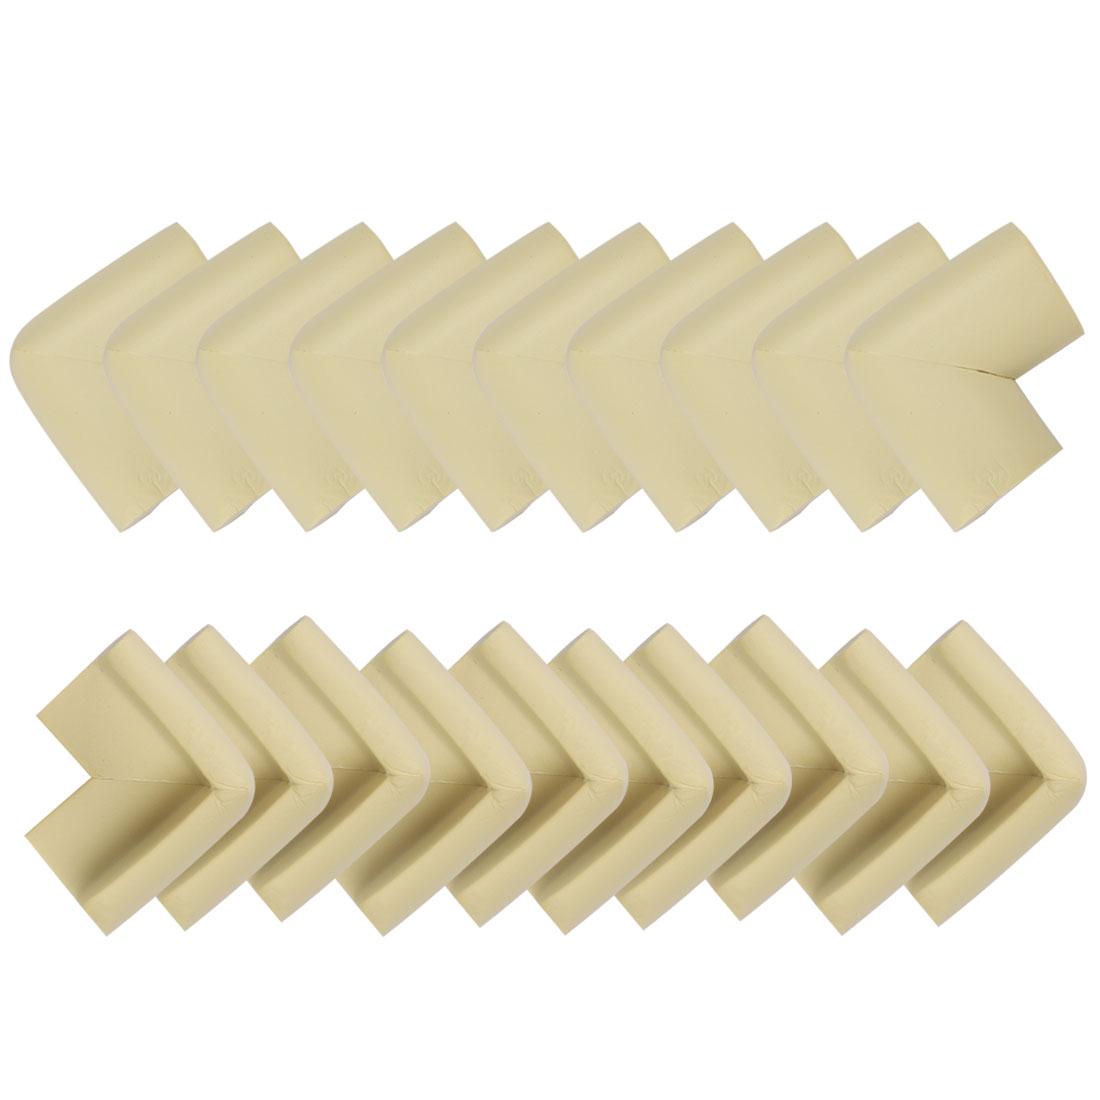 Desk Edge Foam Corner Cushion Guard Strip Soft Bumper Protector 20pcs Beiges